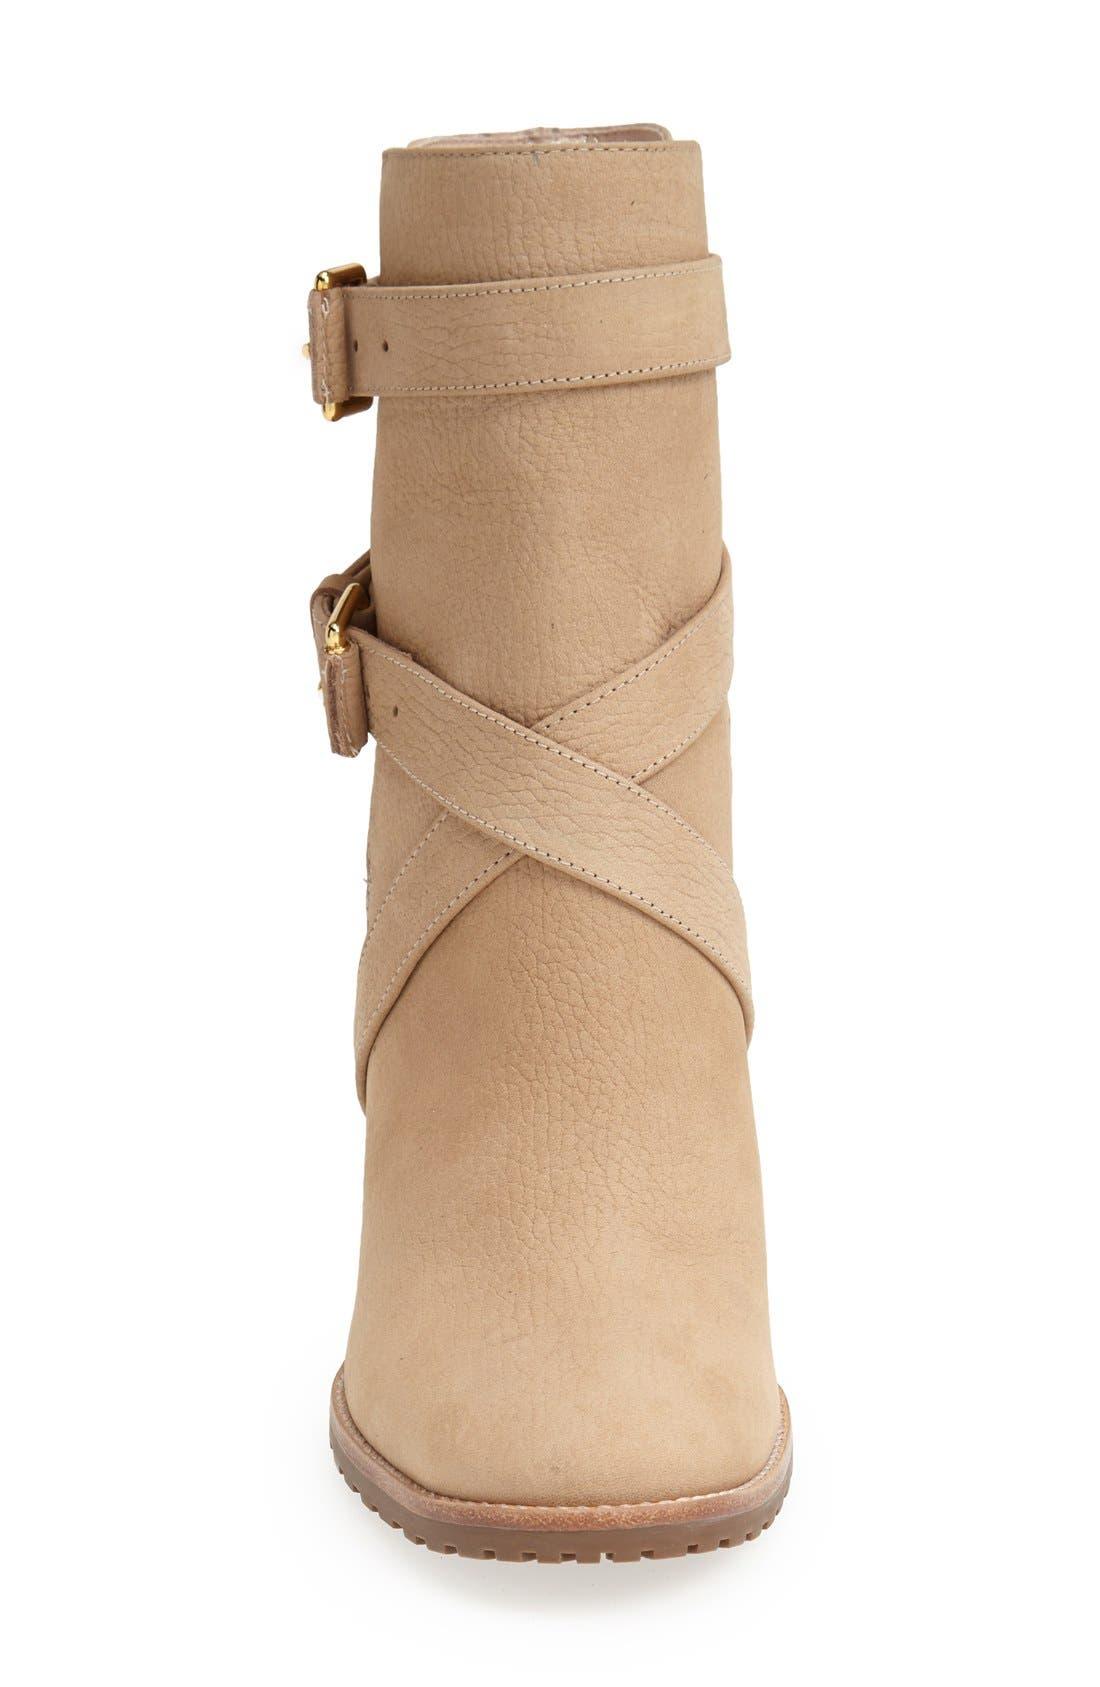 Alternate Image 3  - kate spade new york 'layne' boot (Women)